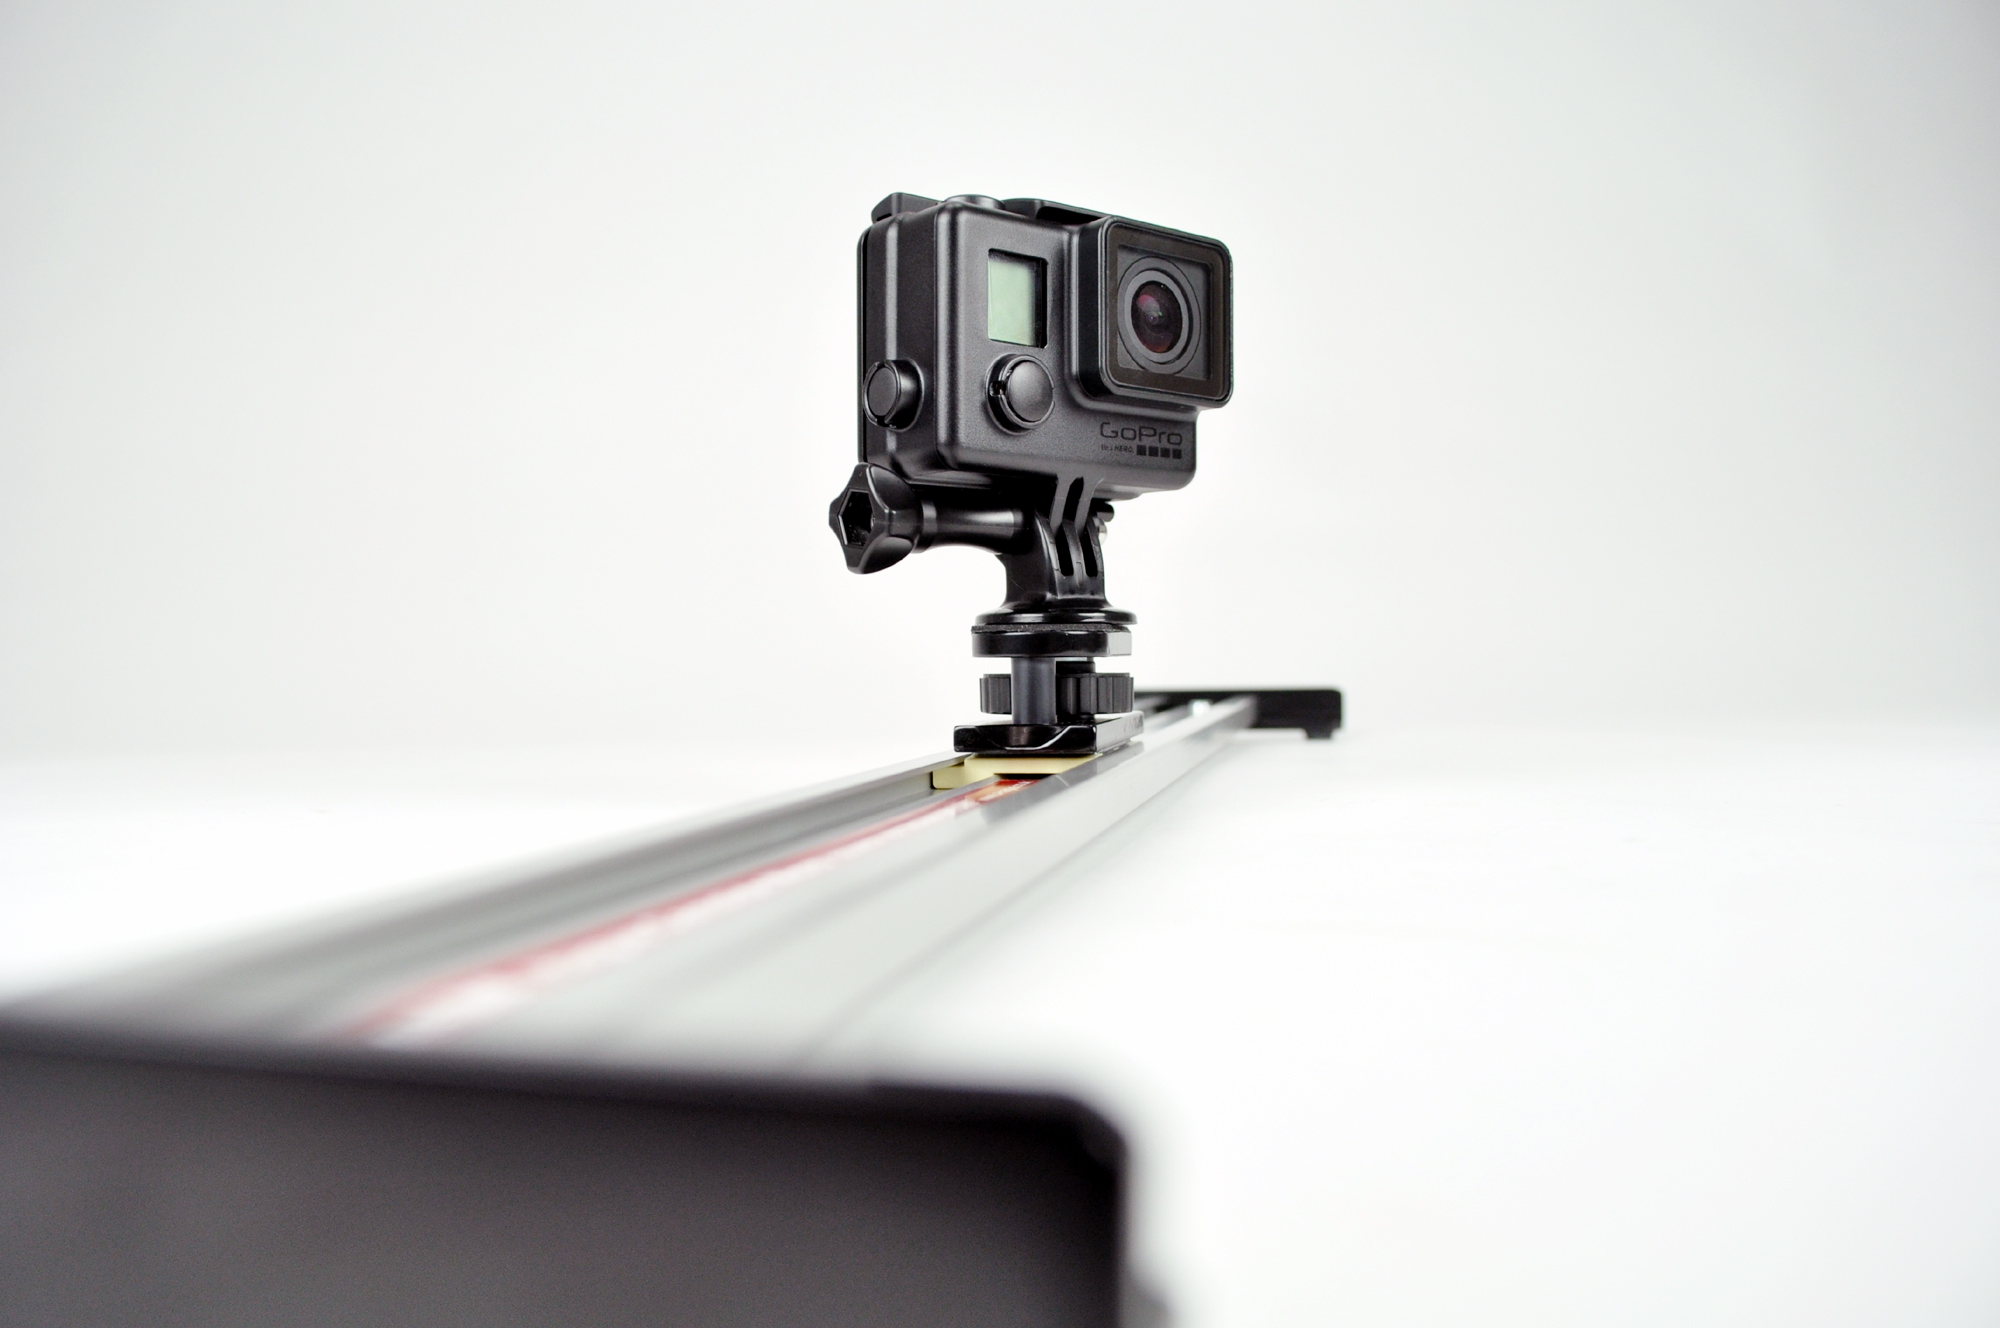 Hague's new Camslide Micro Go